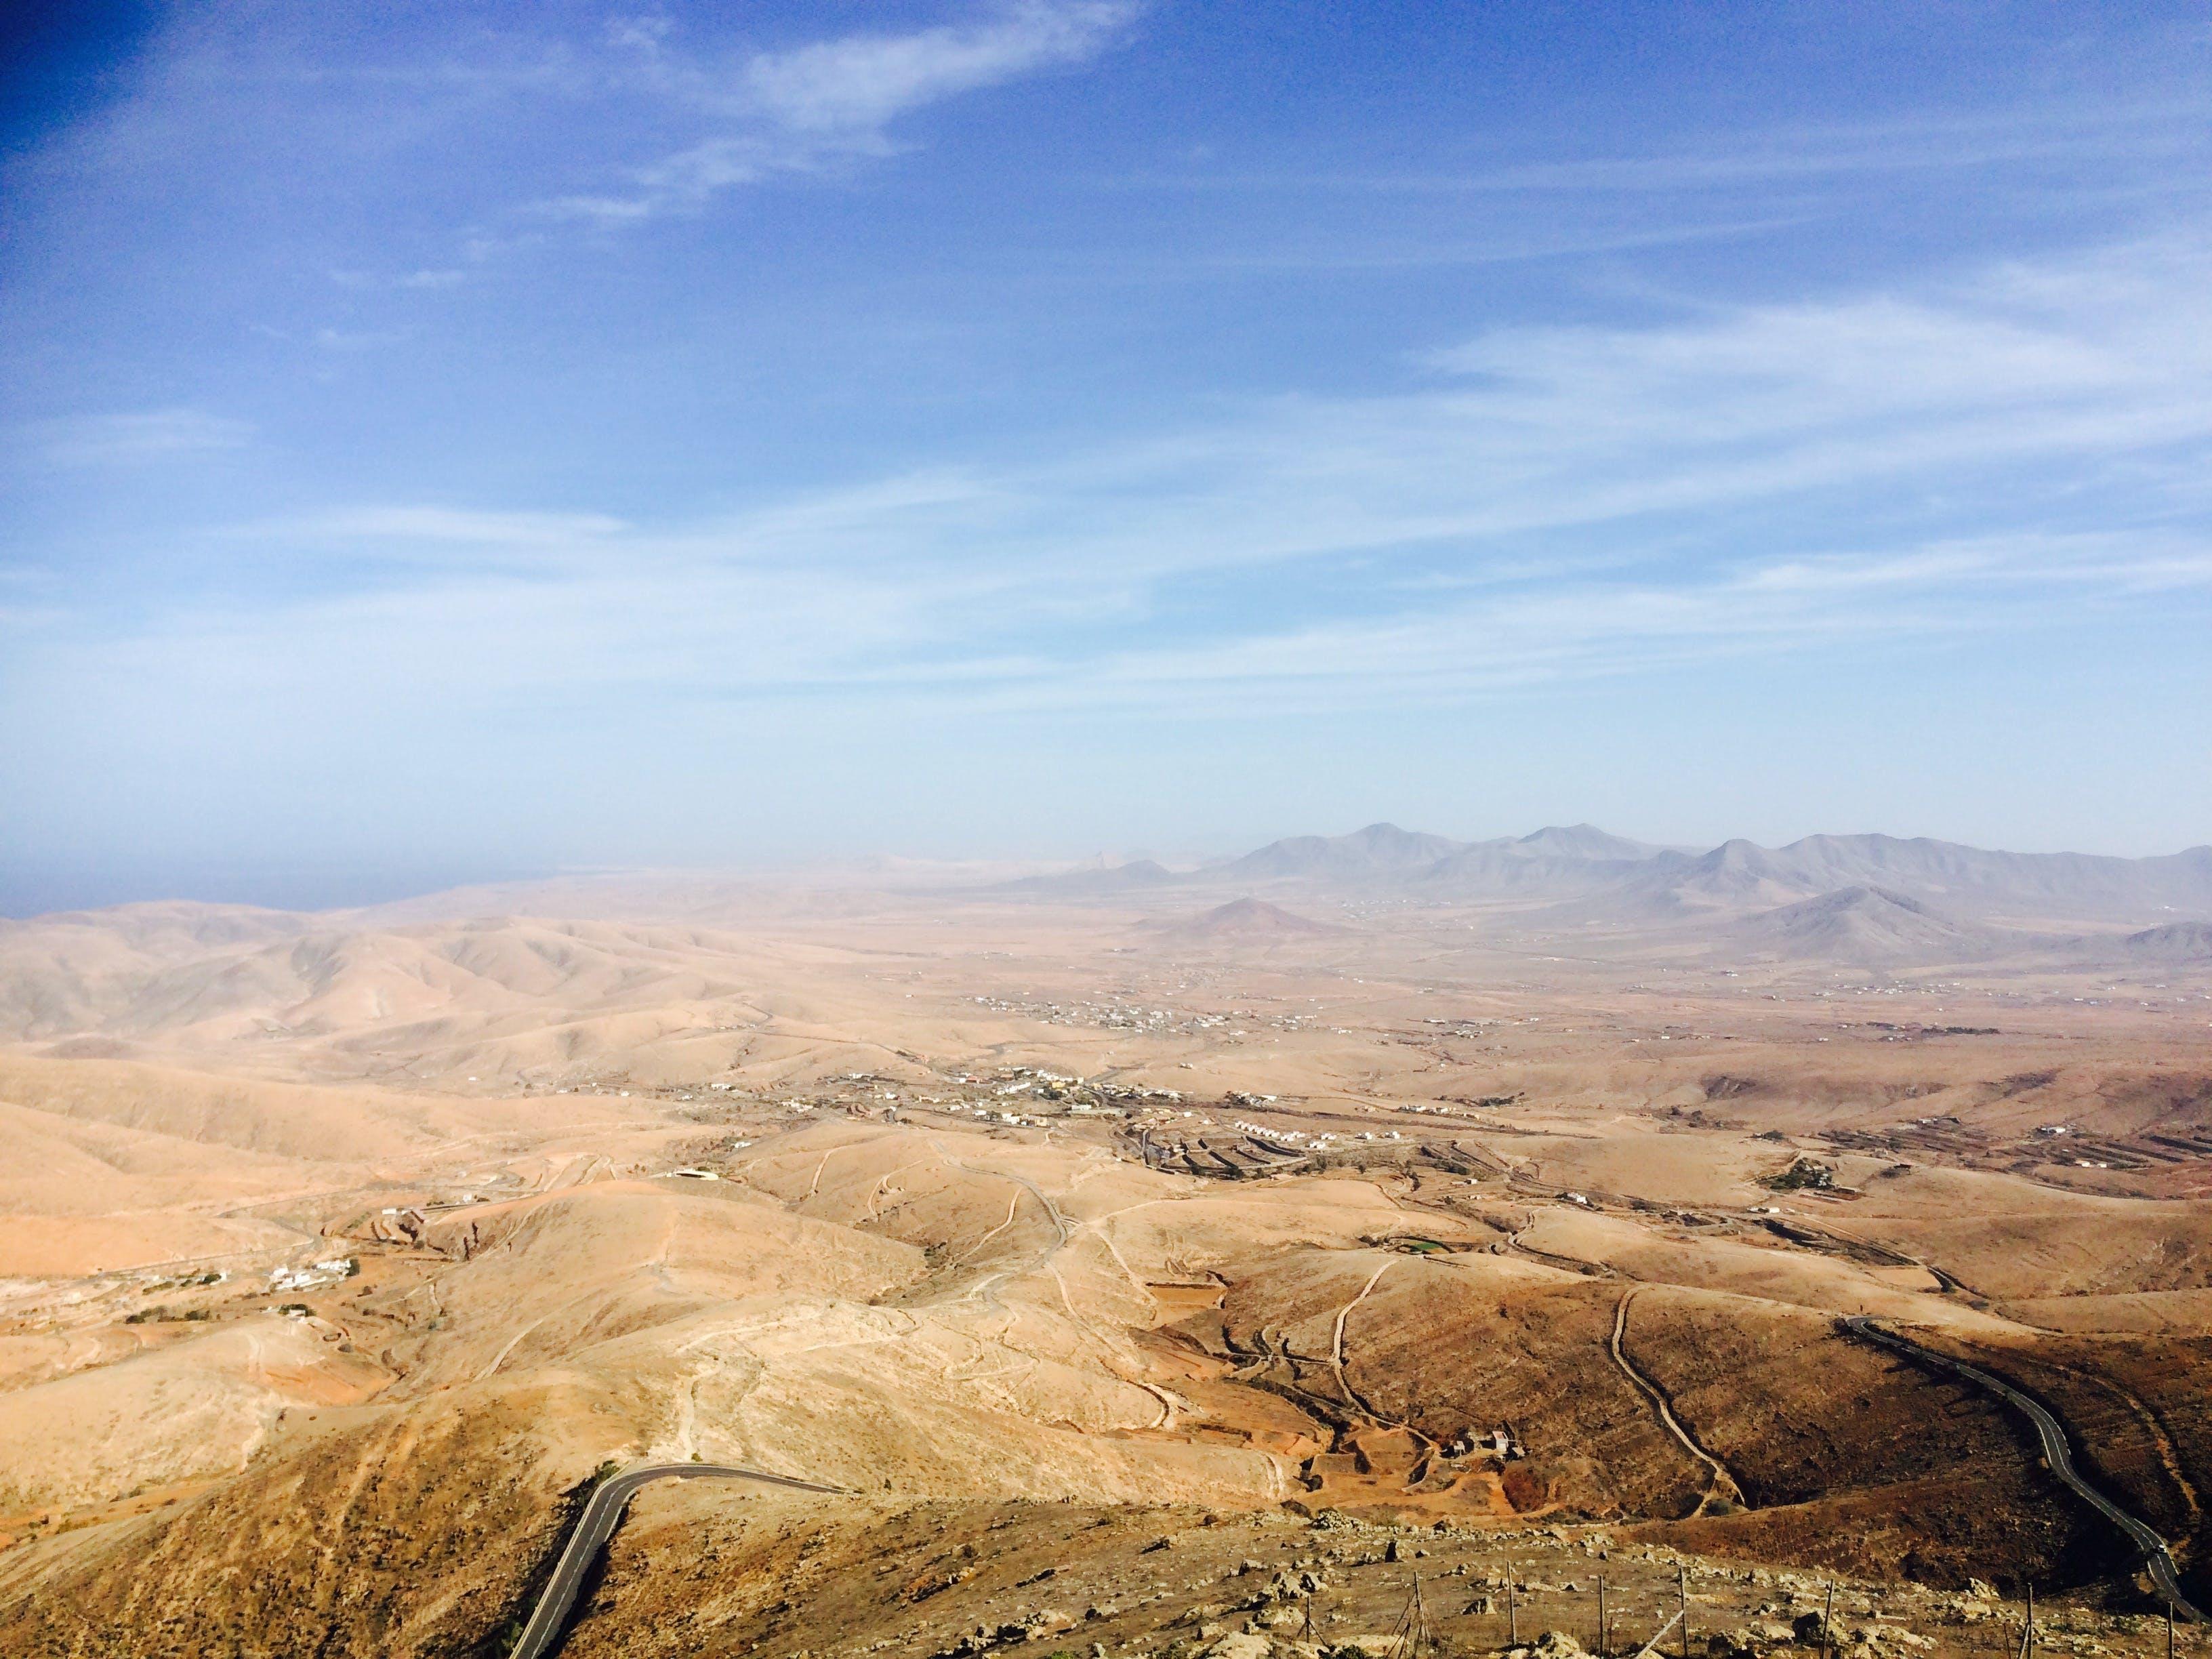 bjerg, fra oven, fugleperspektiv